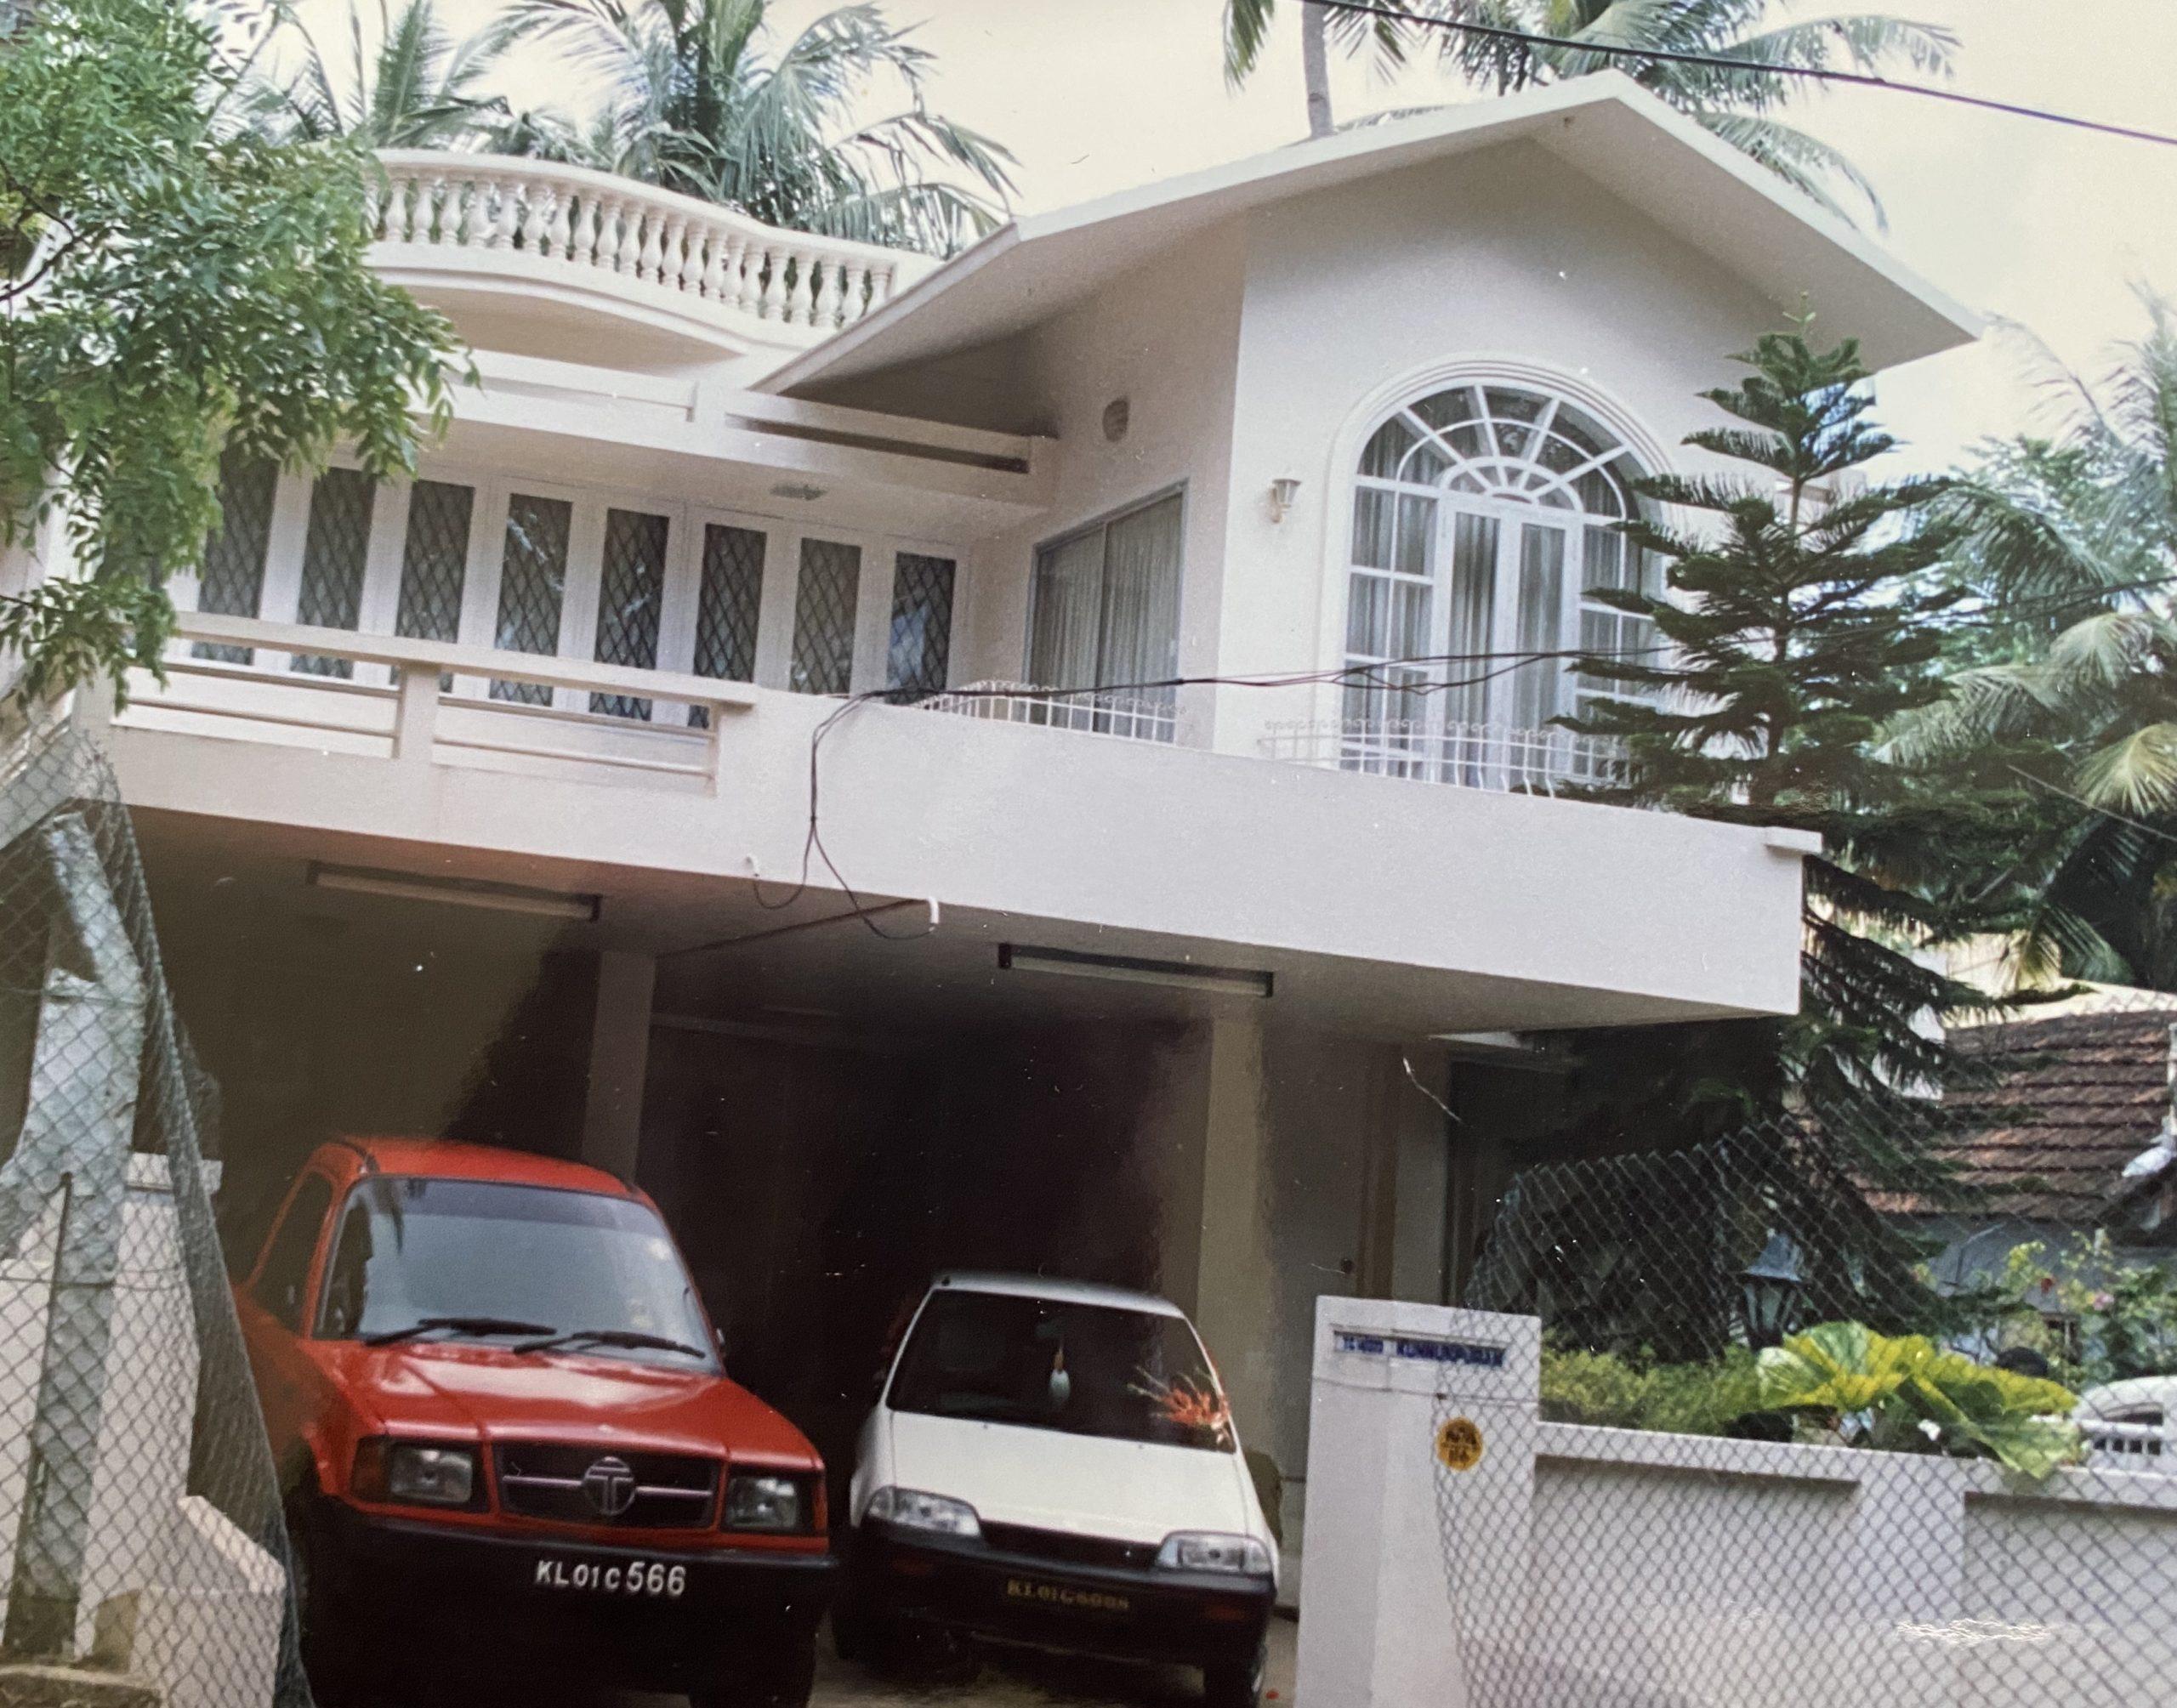 Villa in prime location for sale at Nandavanam, Palayam, Thiruvananthapuram